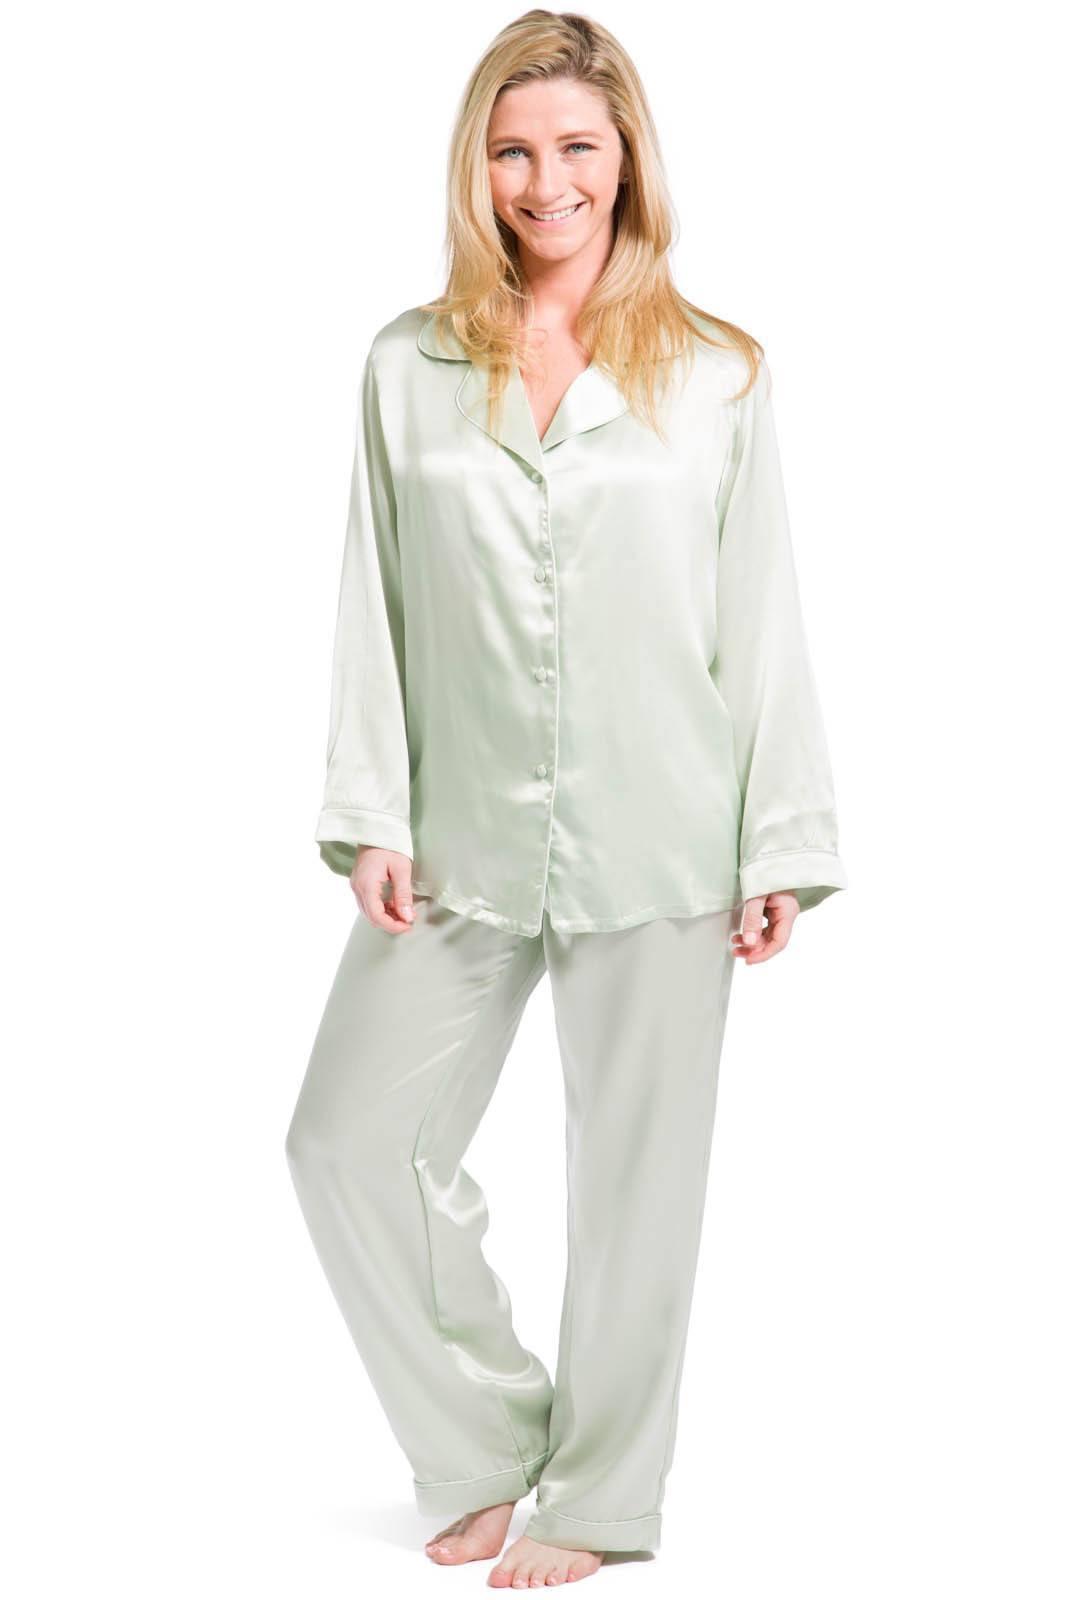 pajamas for women womensu003esleep and loungeu003epajamas - womenu0027s 100% mulberry silk classic full  length hkqouxj